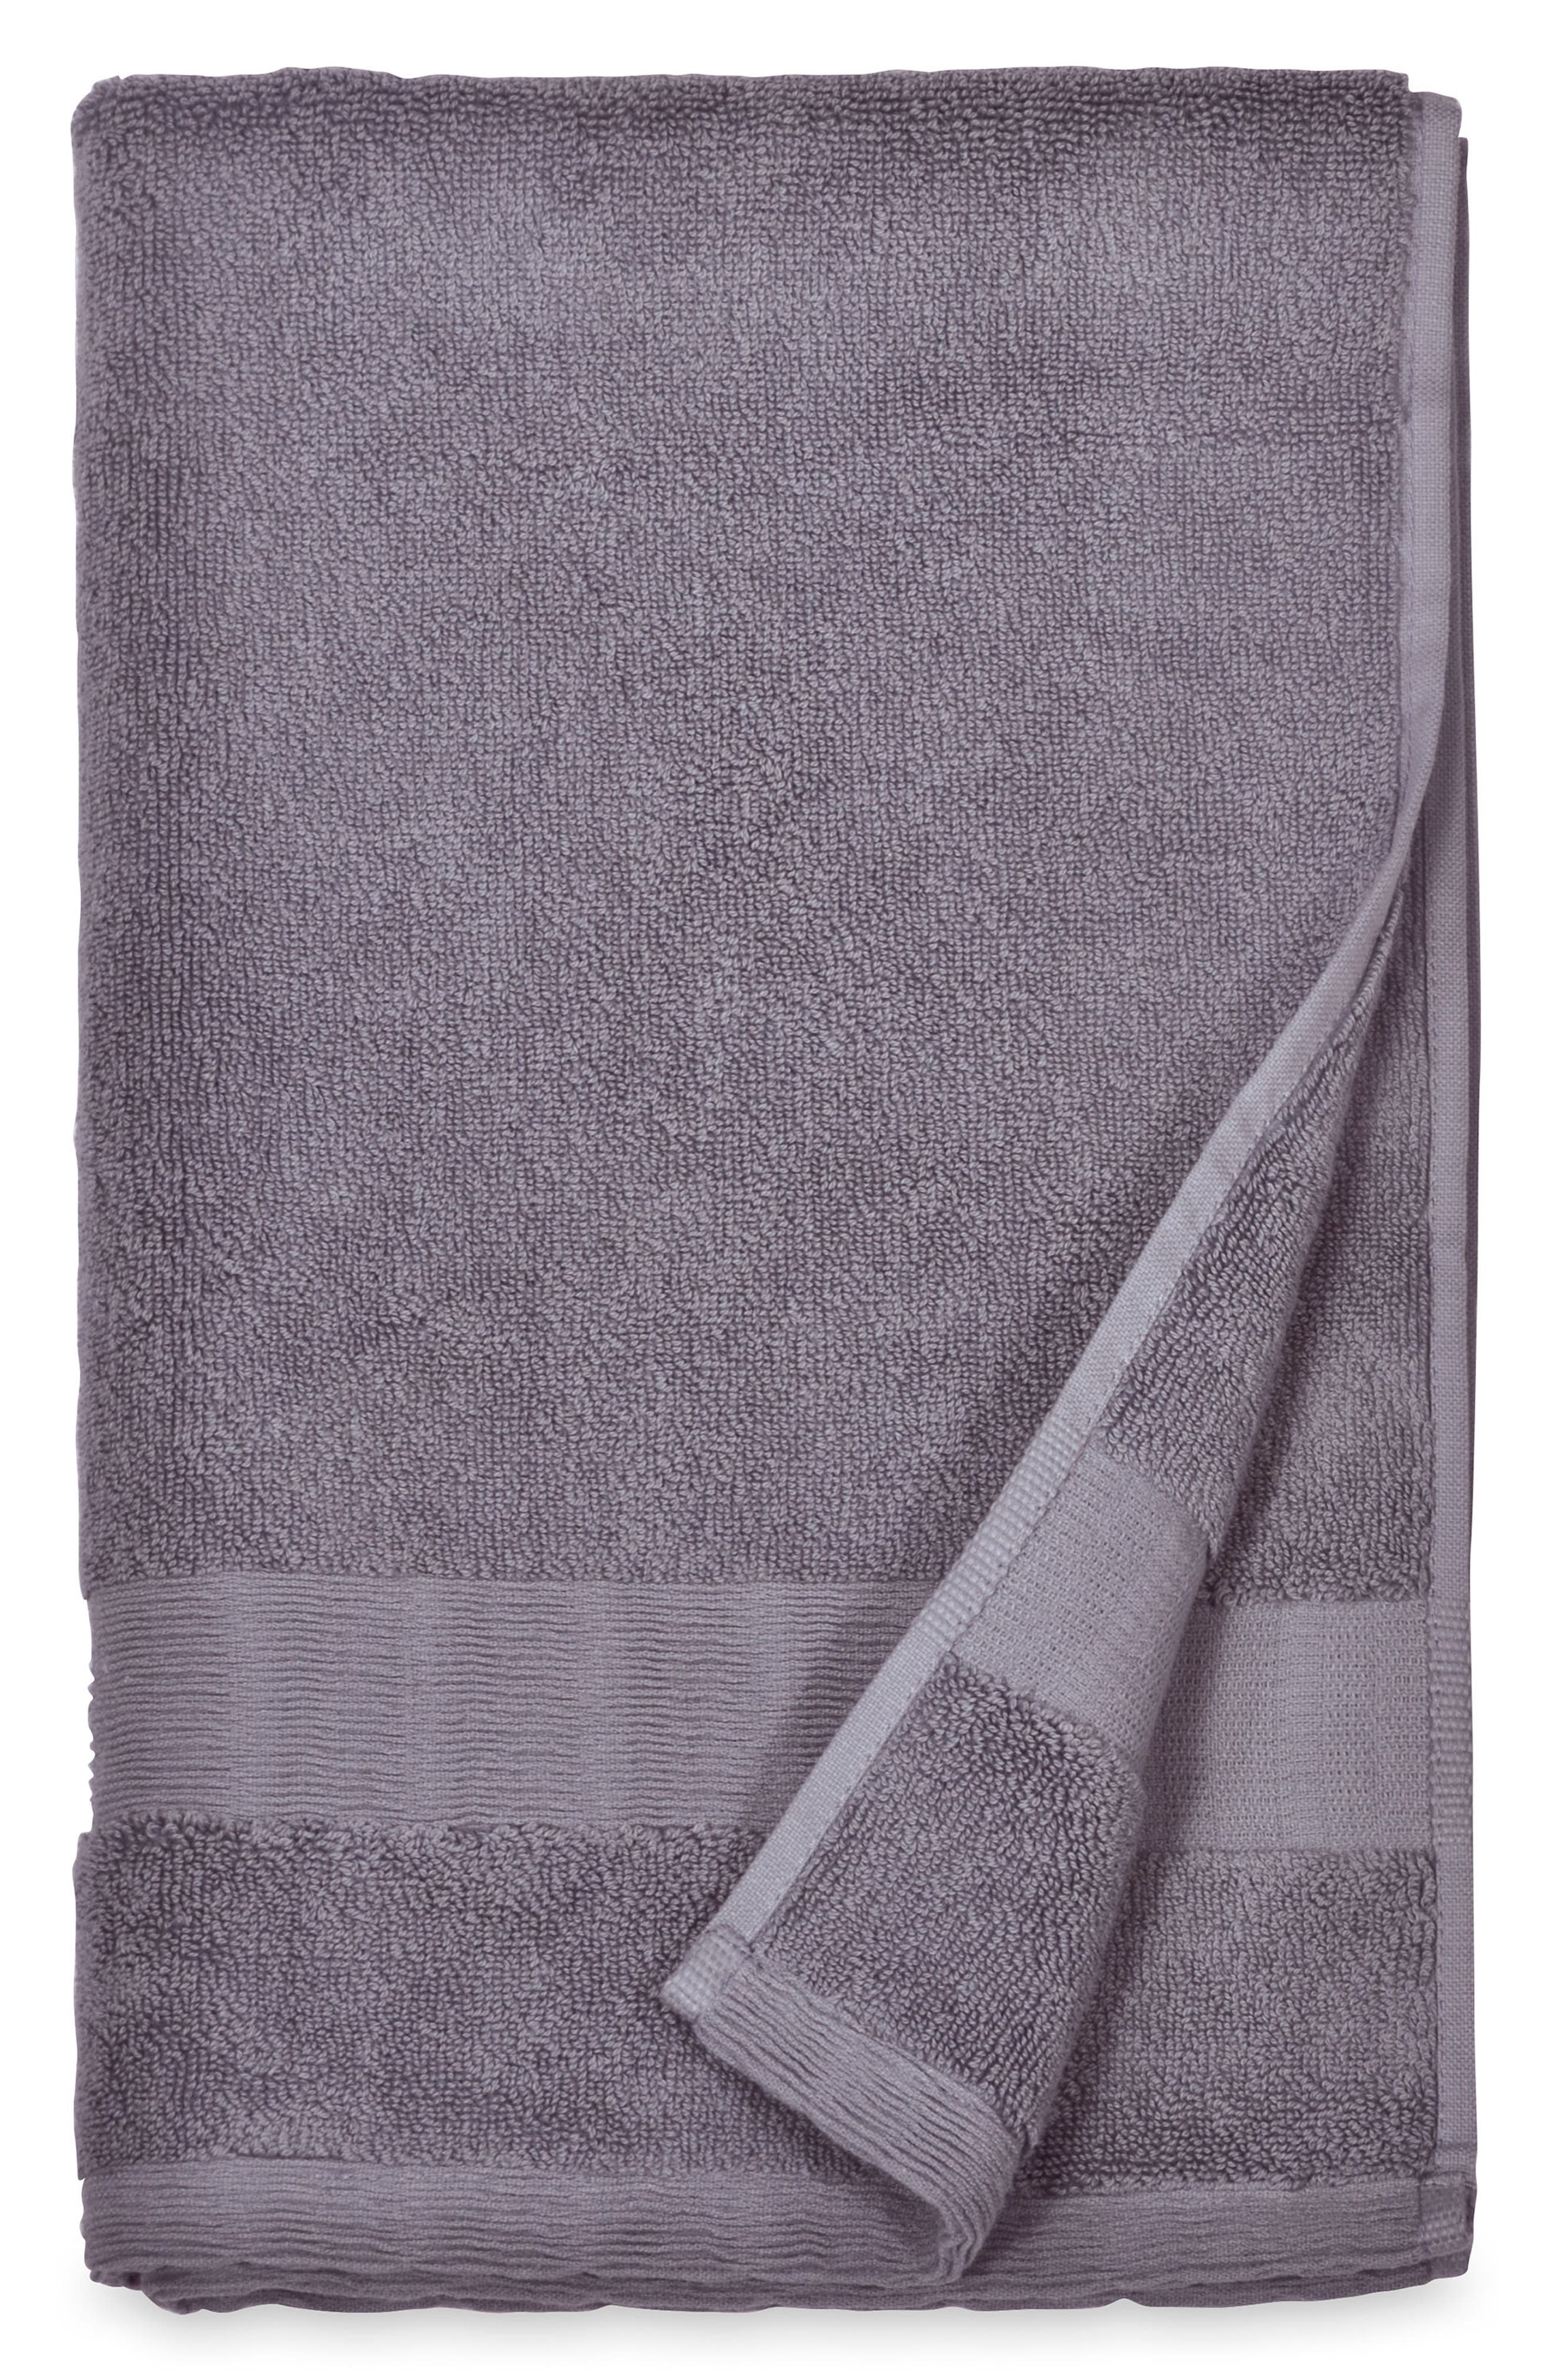 Mercer Hand Towel,                             Main thumbnail 1, color,                             531